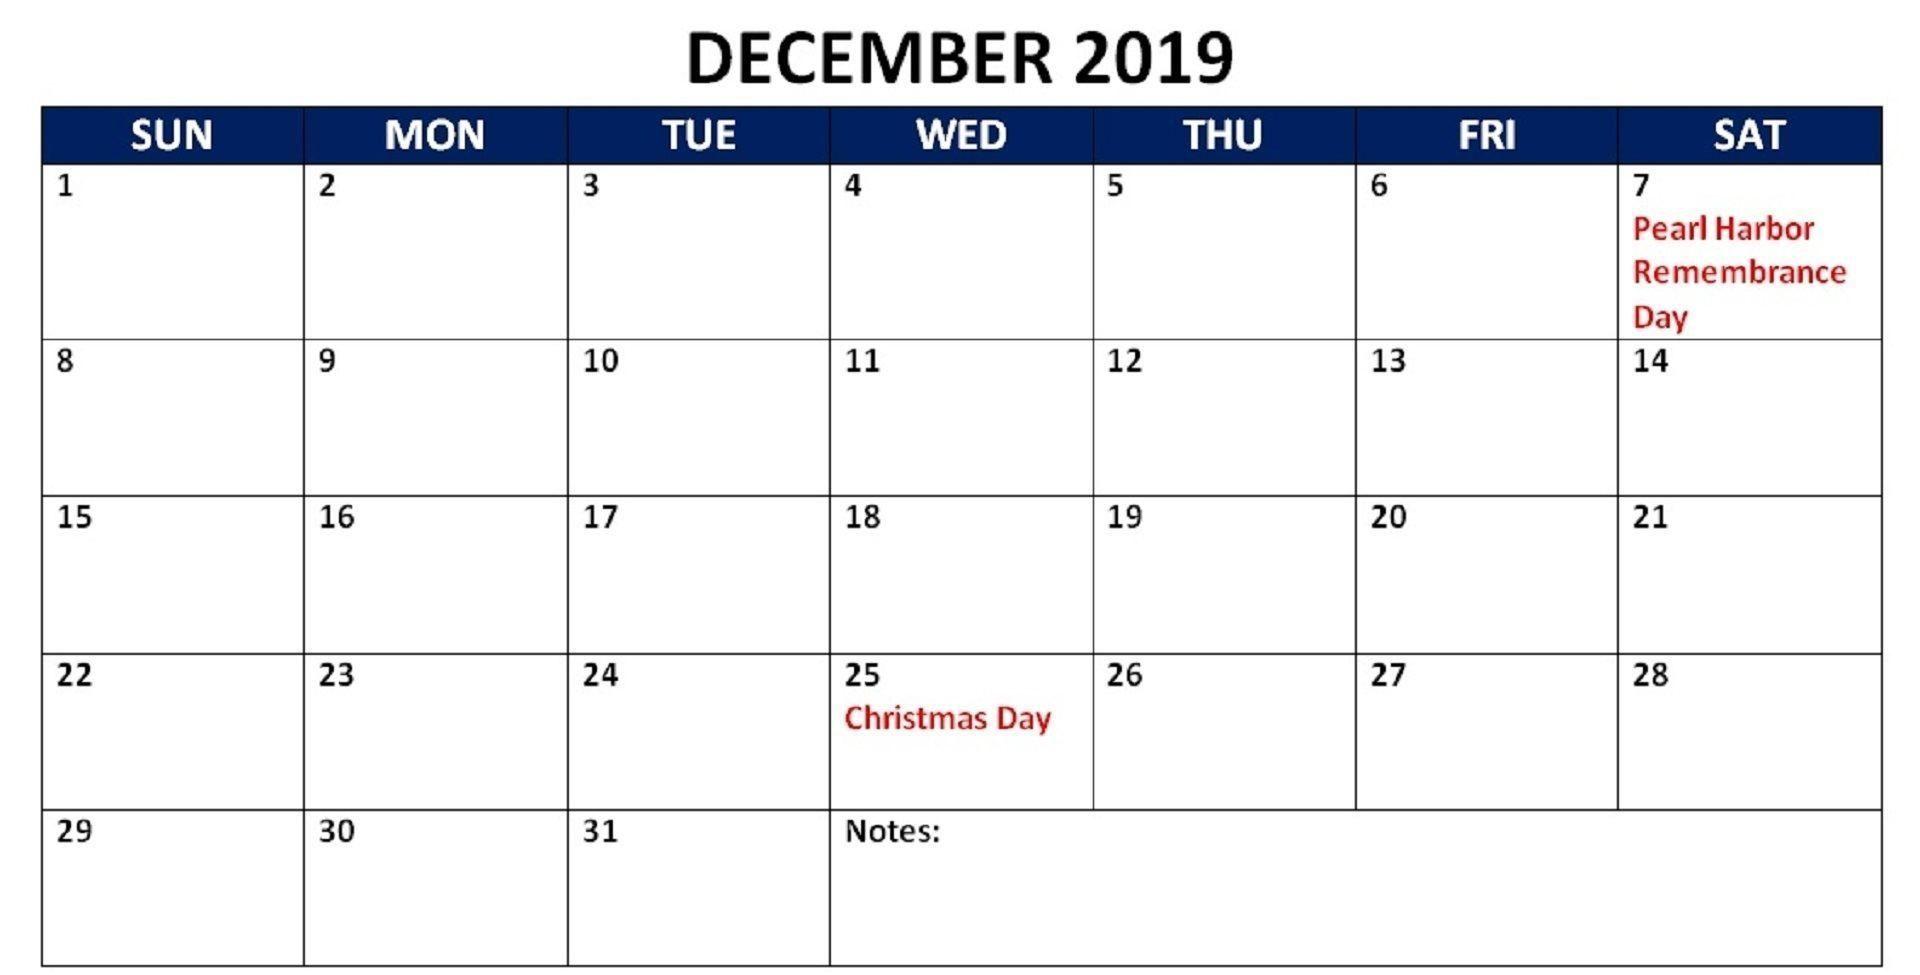 December 2019 USA Holidays Calendar